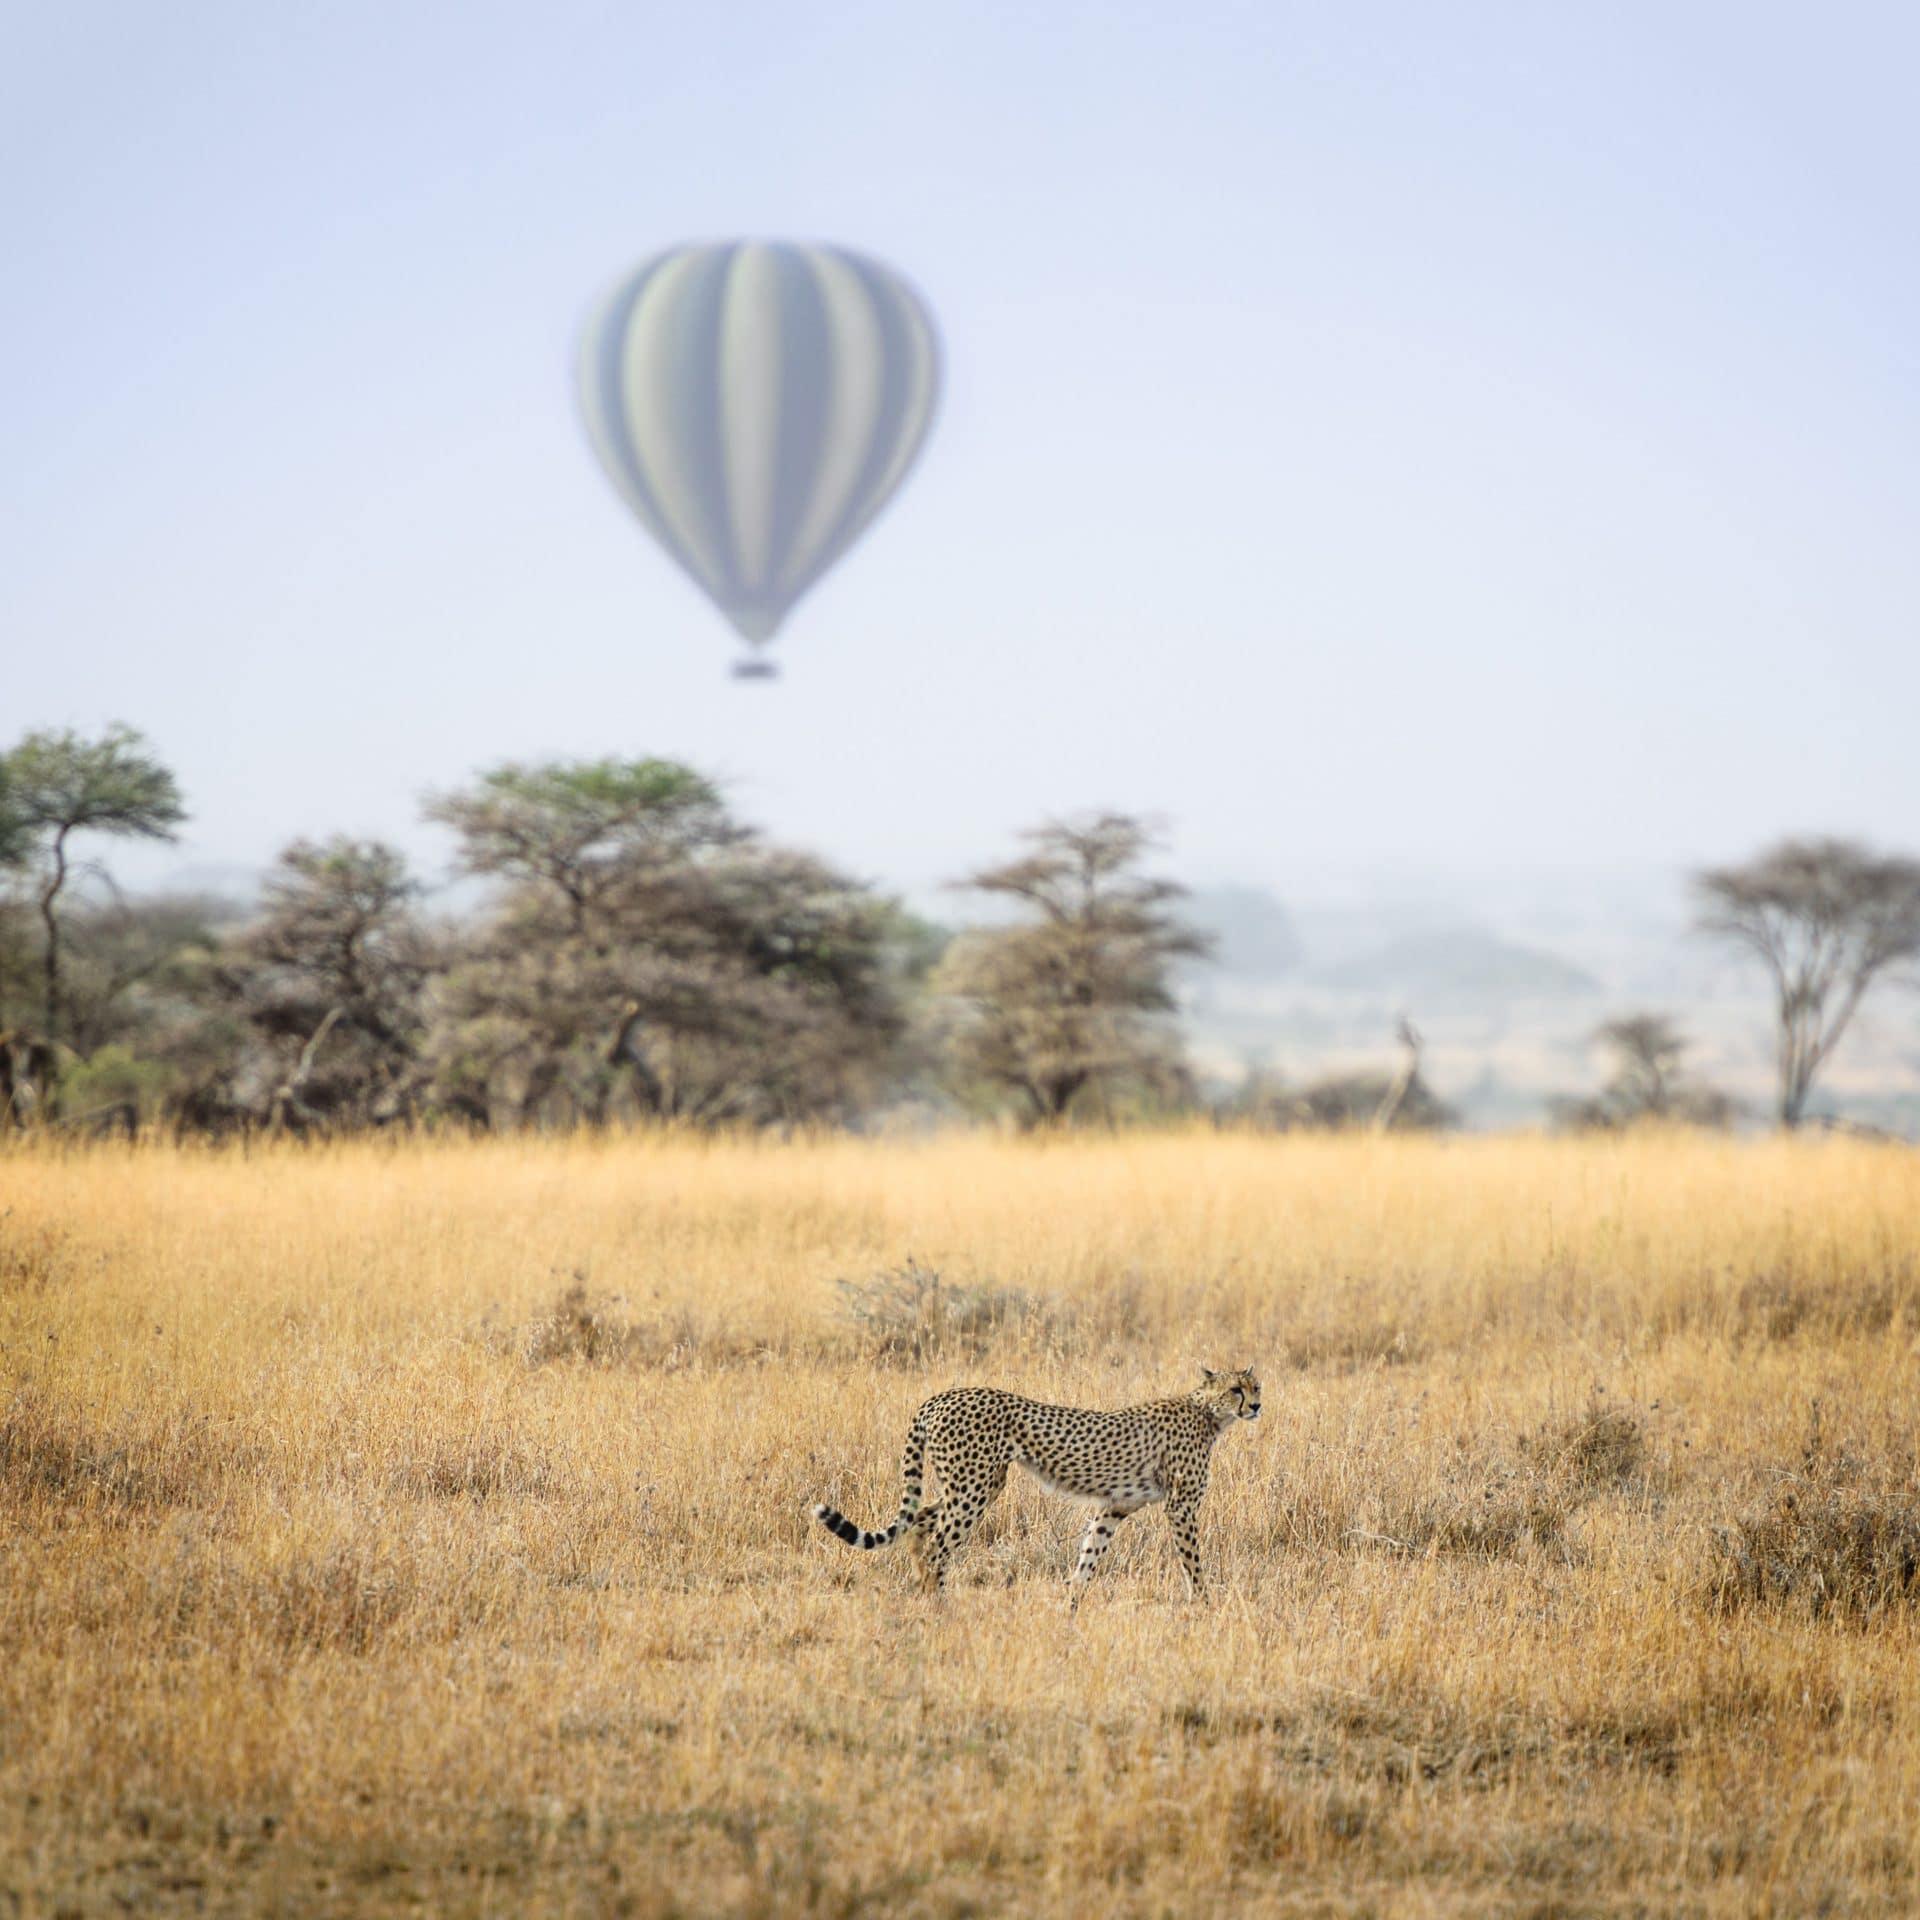 Cheetah seen on Tanzanian safari